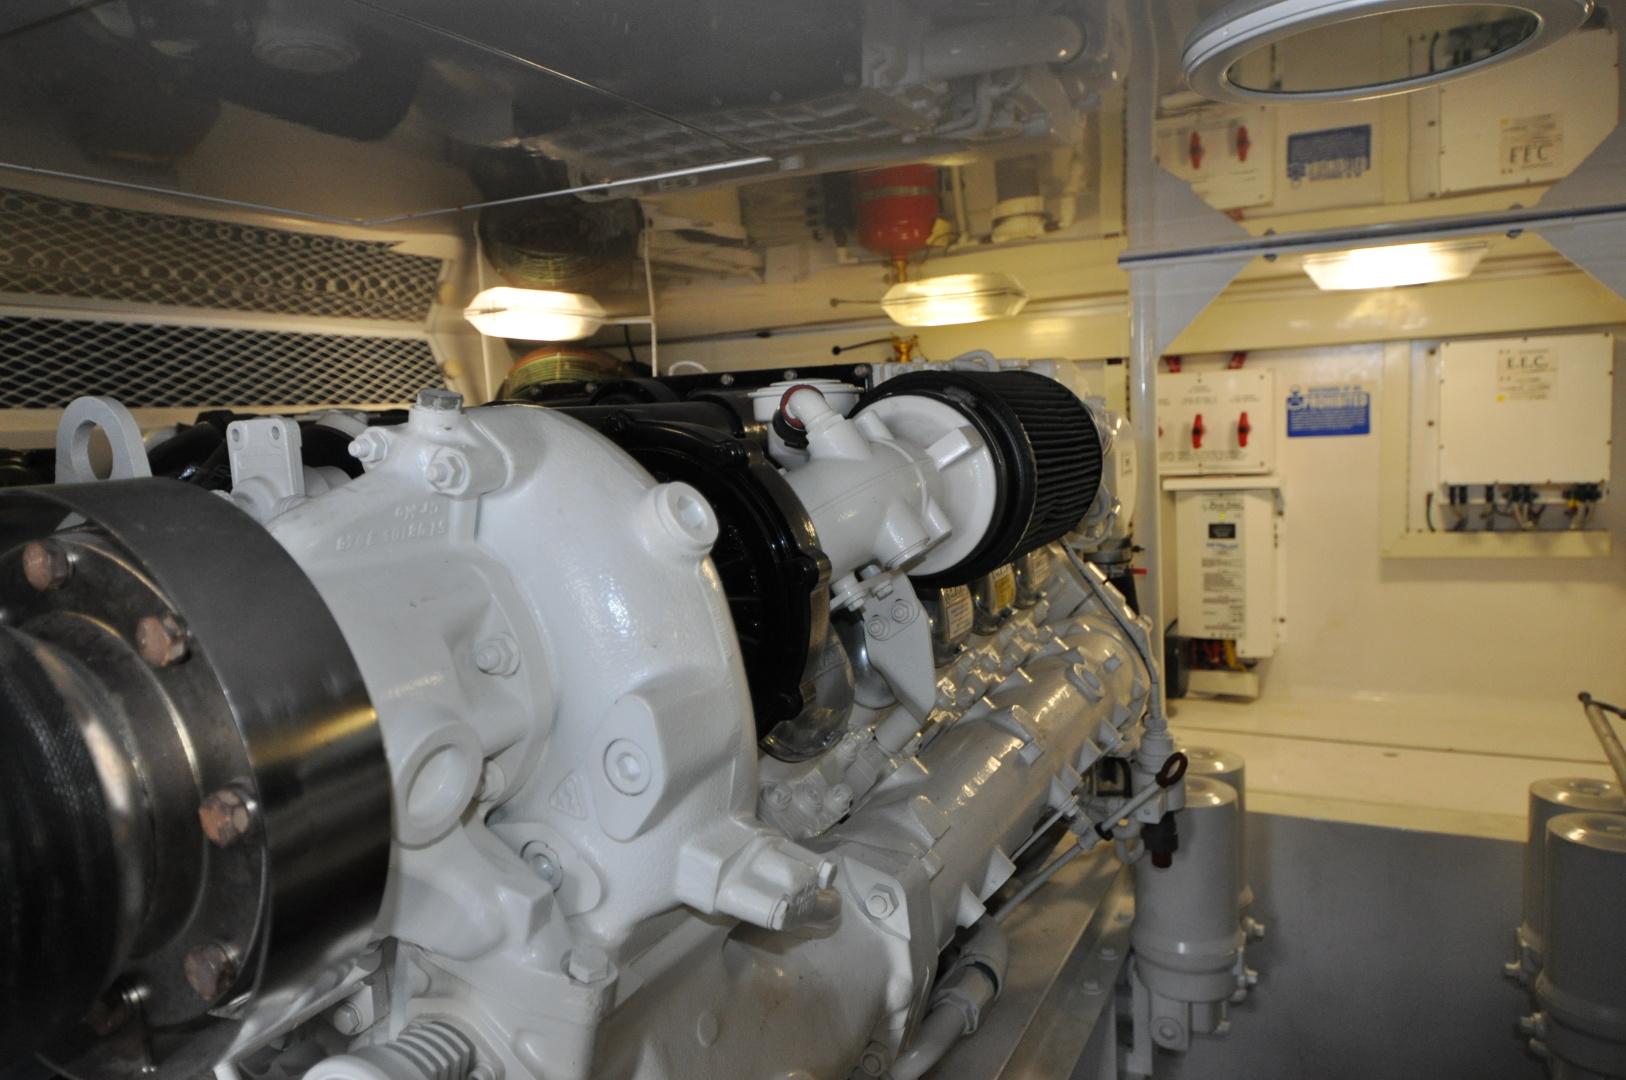 Viking-Convertible 2003-Reel Cowboy Deerfield Beach-Florida-United States-Engine Room-1546887 | Thumbnail